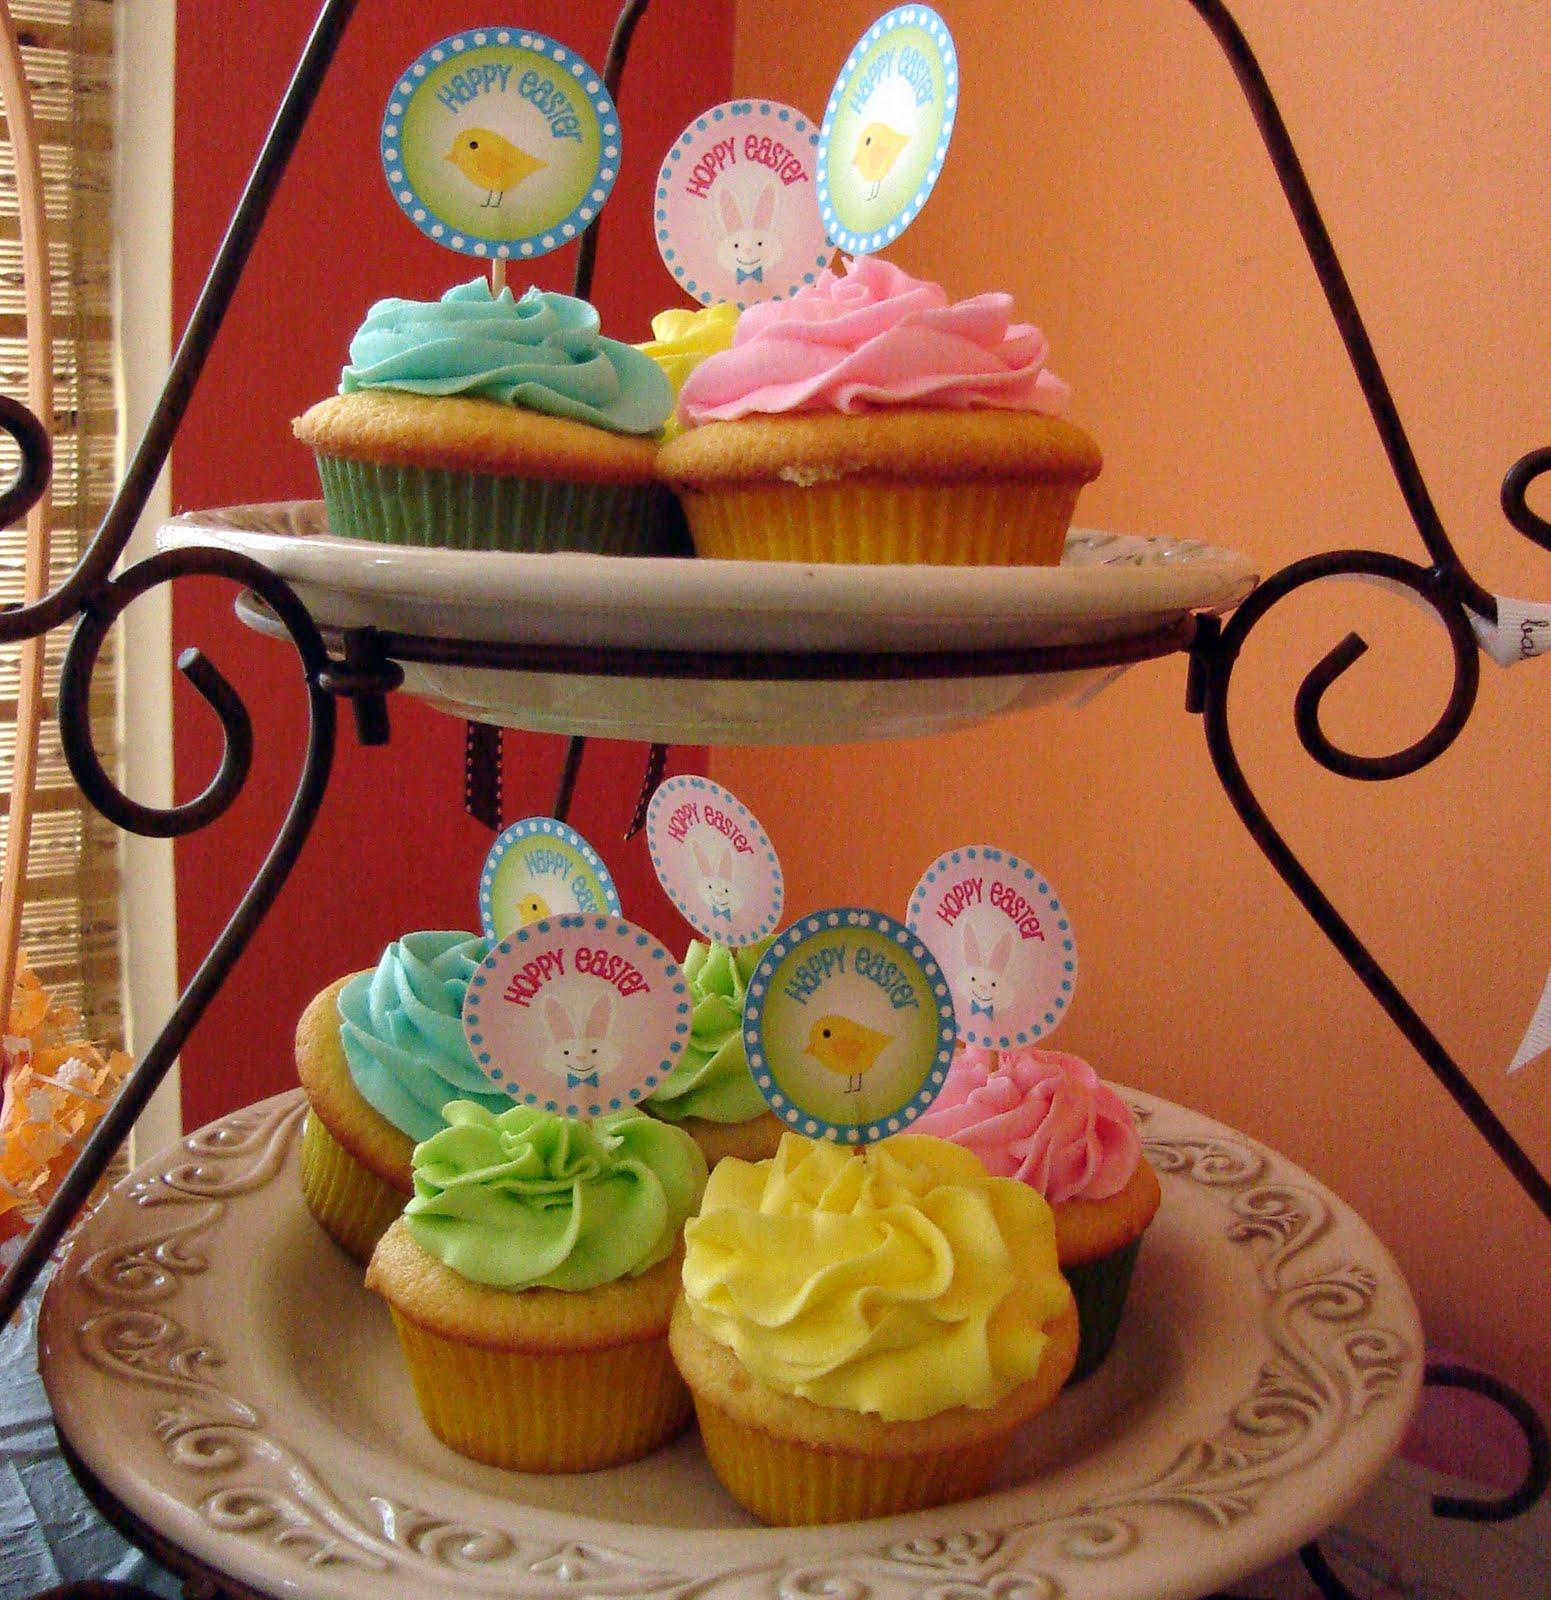 http://2.bp.blogspot.com/_r4c80ZXXzGo/S7K8Q-wmm0I/AAAAAAAAA4c/Y_sYLicOccw/s1600/Easter+Cupcakes+and+Basket+Giveaway+_Blog_Pic.jpg